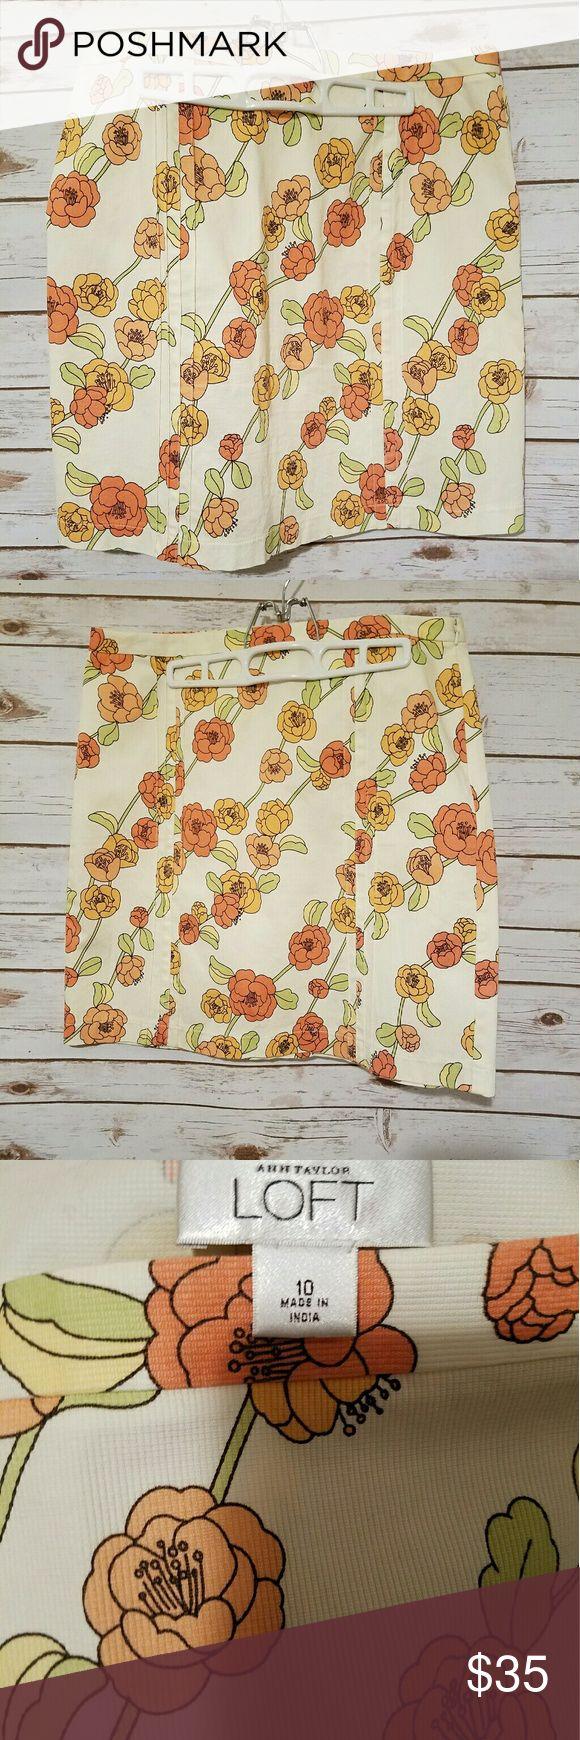 Anne Taylor Loft skirt Floral pattern pencil skirt Ann Taylor Skirts Pencil